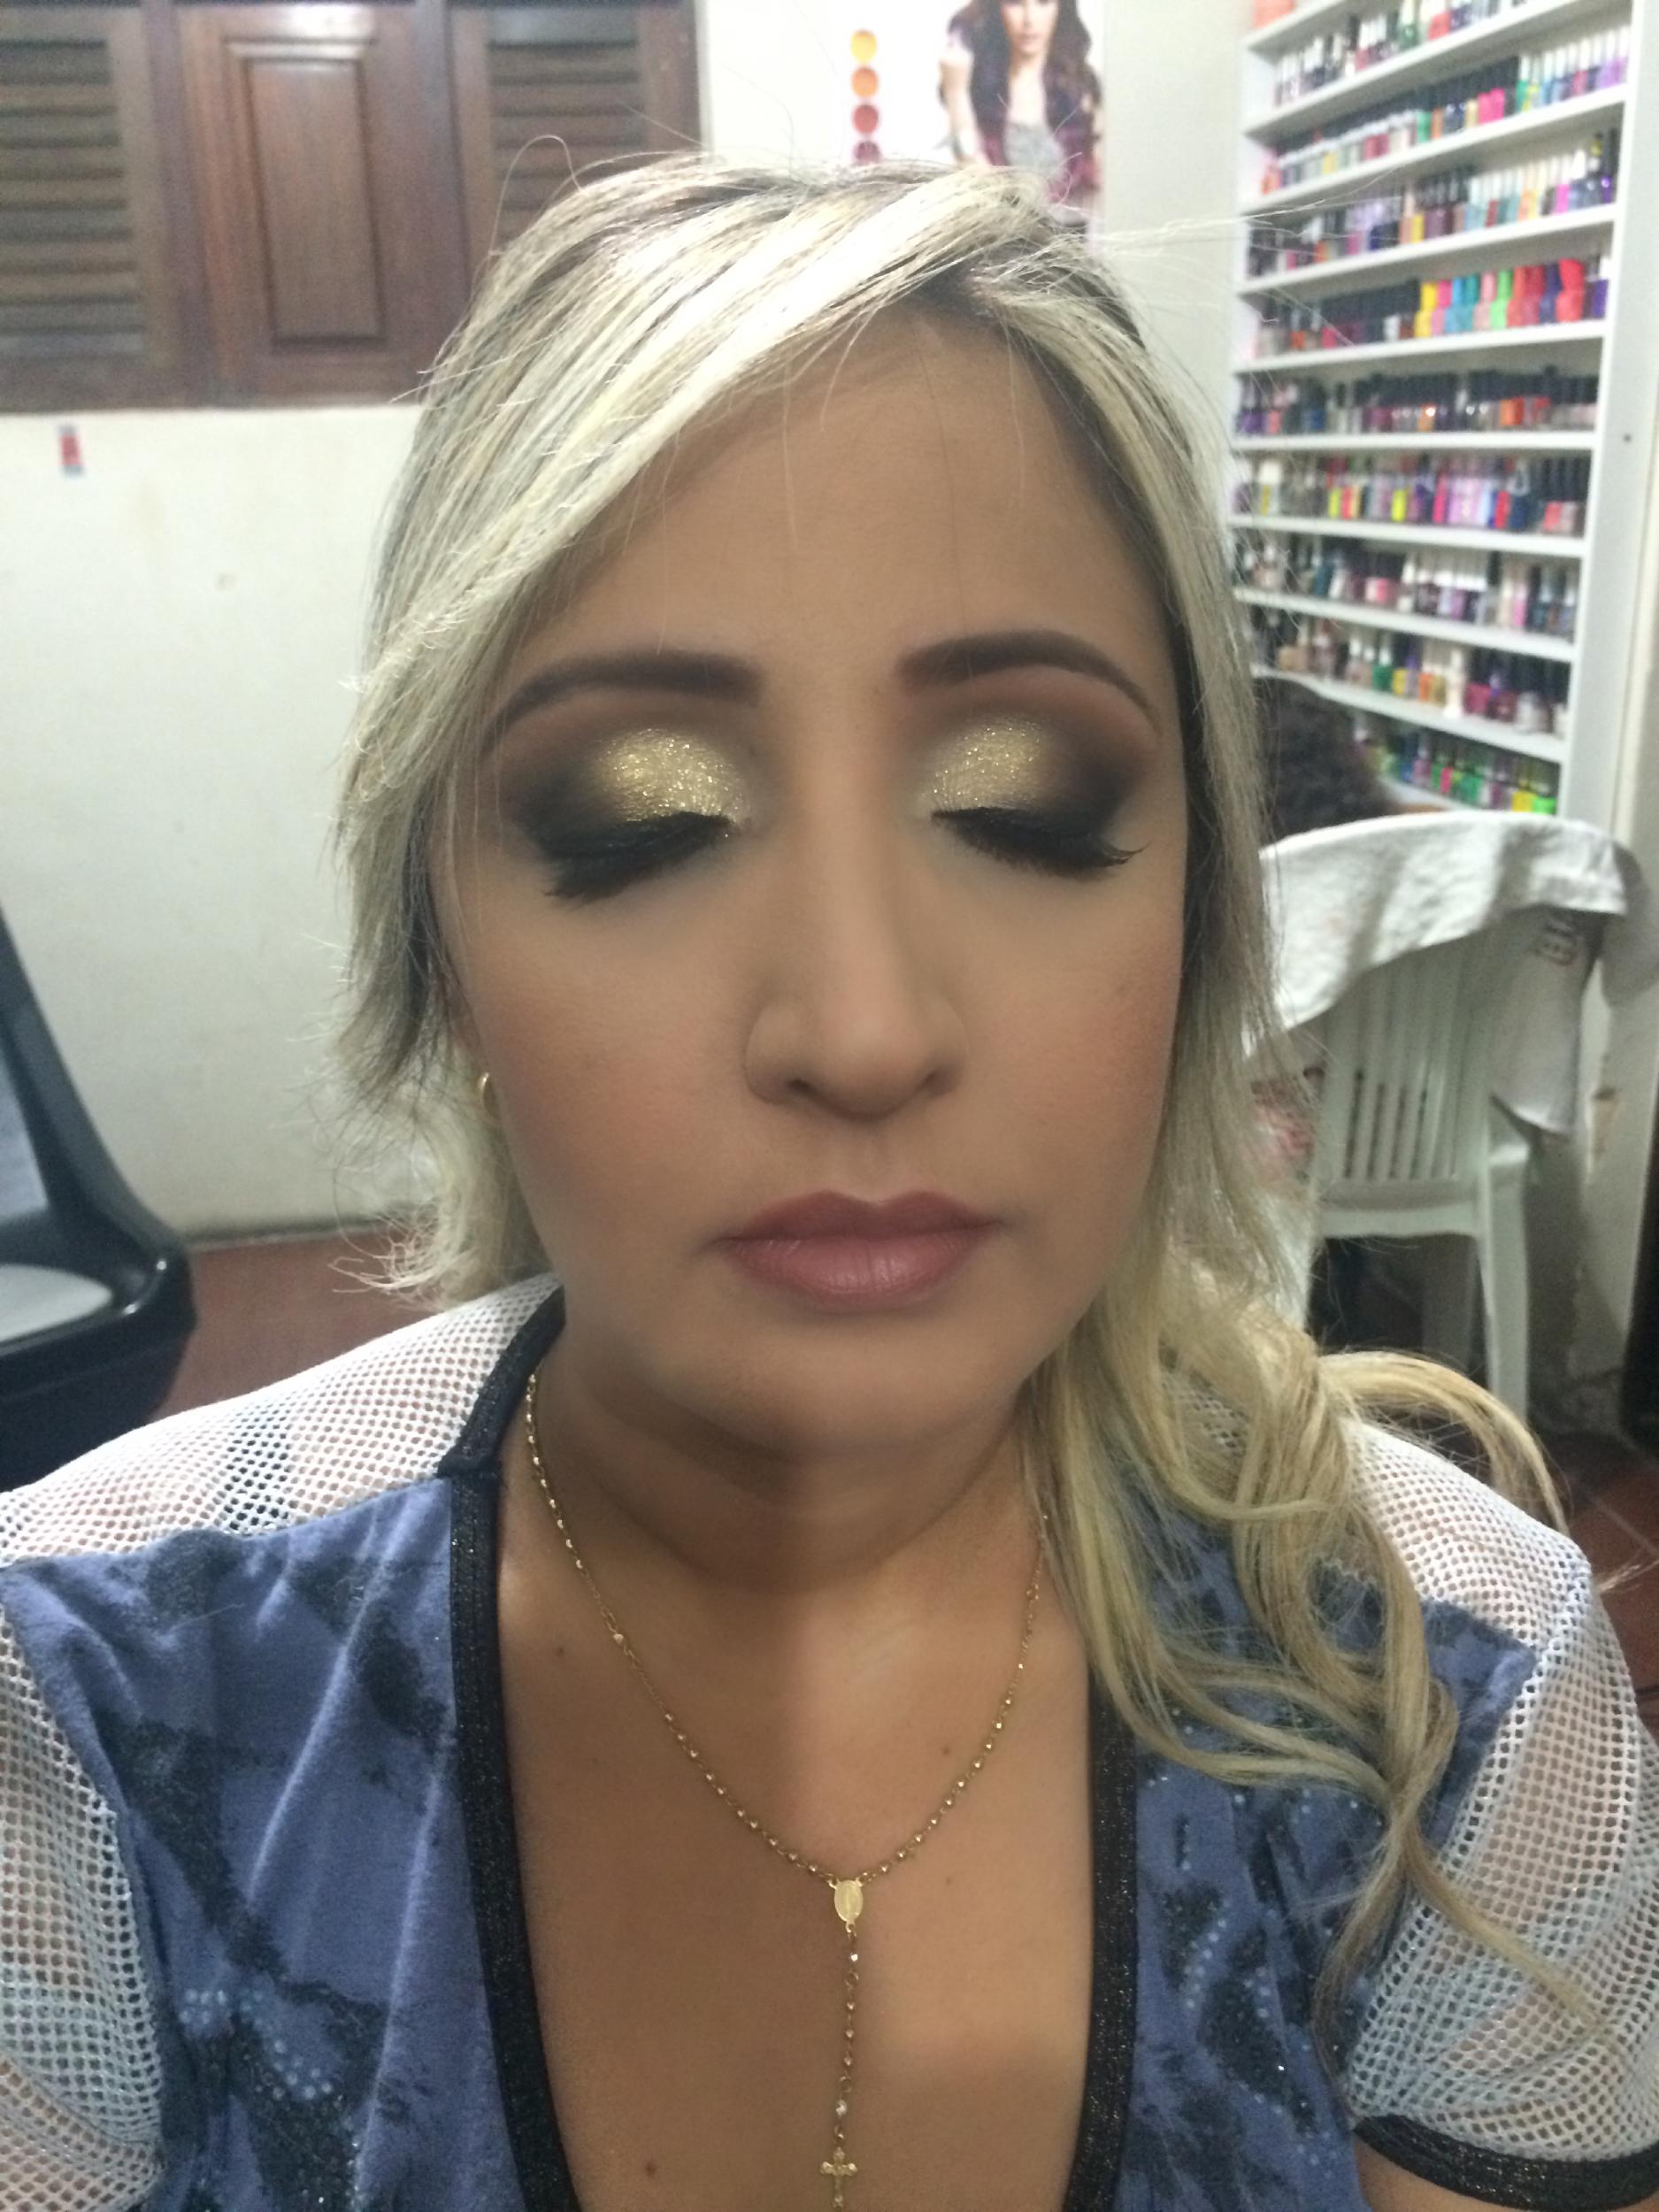 #tracta #vult #dailus #marykay #revlon #contem1g maquiagem maquiador(a)